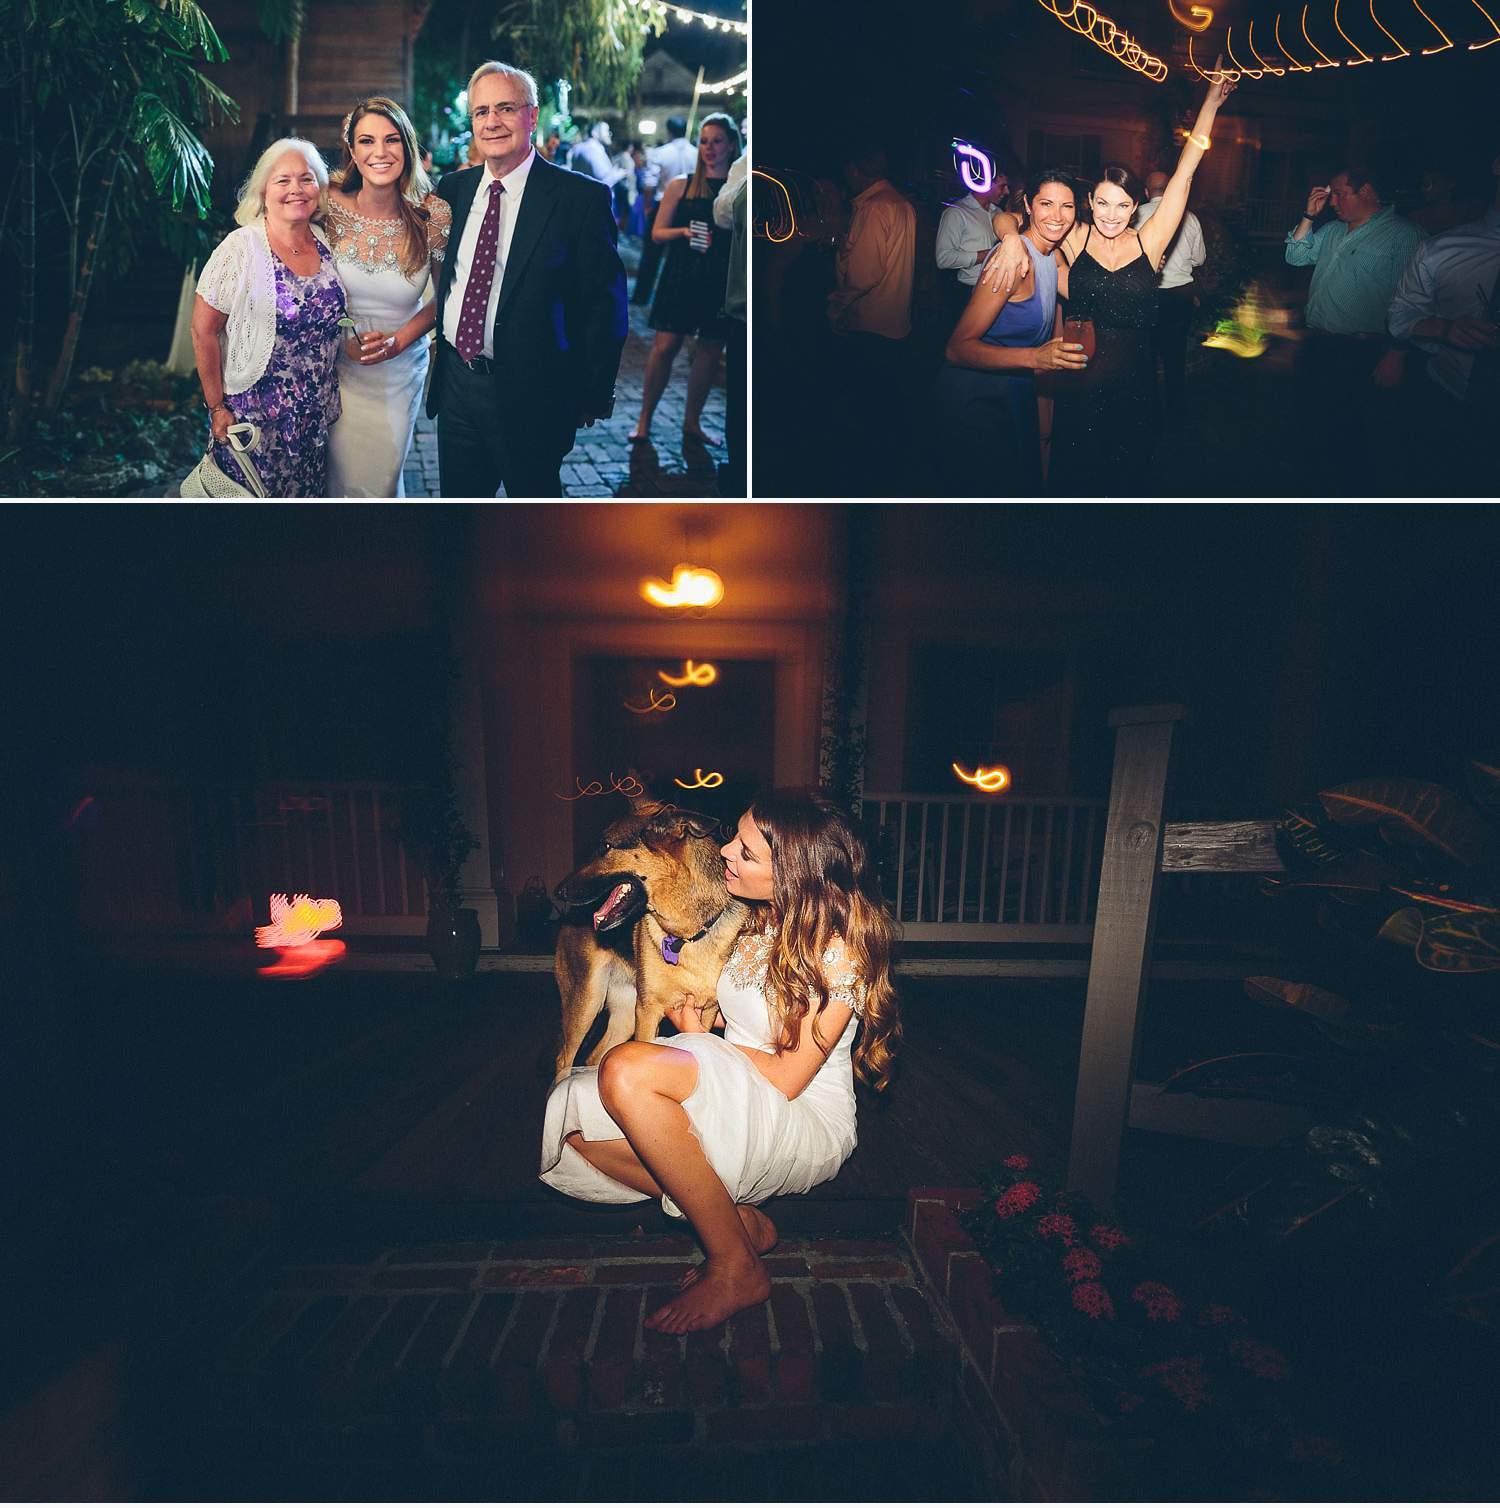 audubon-house-key-west-wedding-photographer-daniel-lateulade-0035.JPG